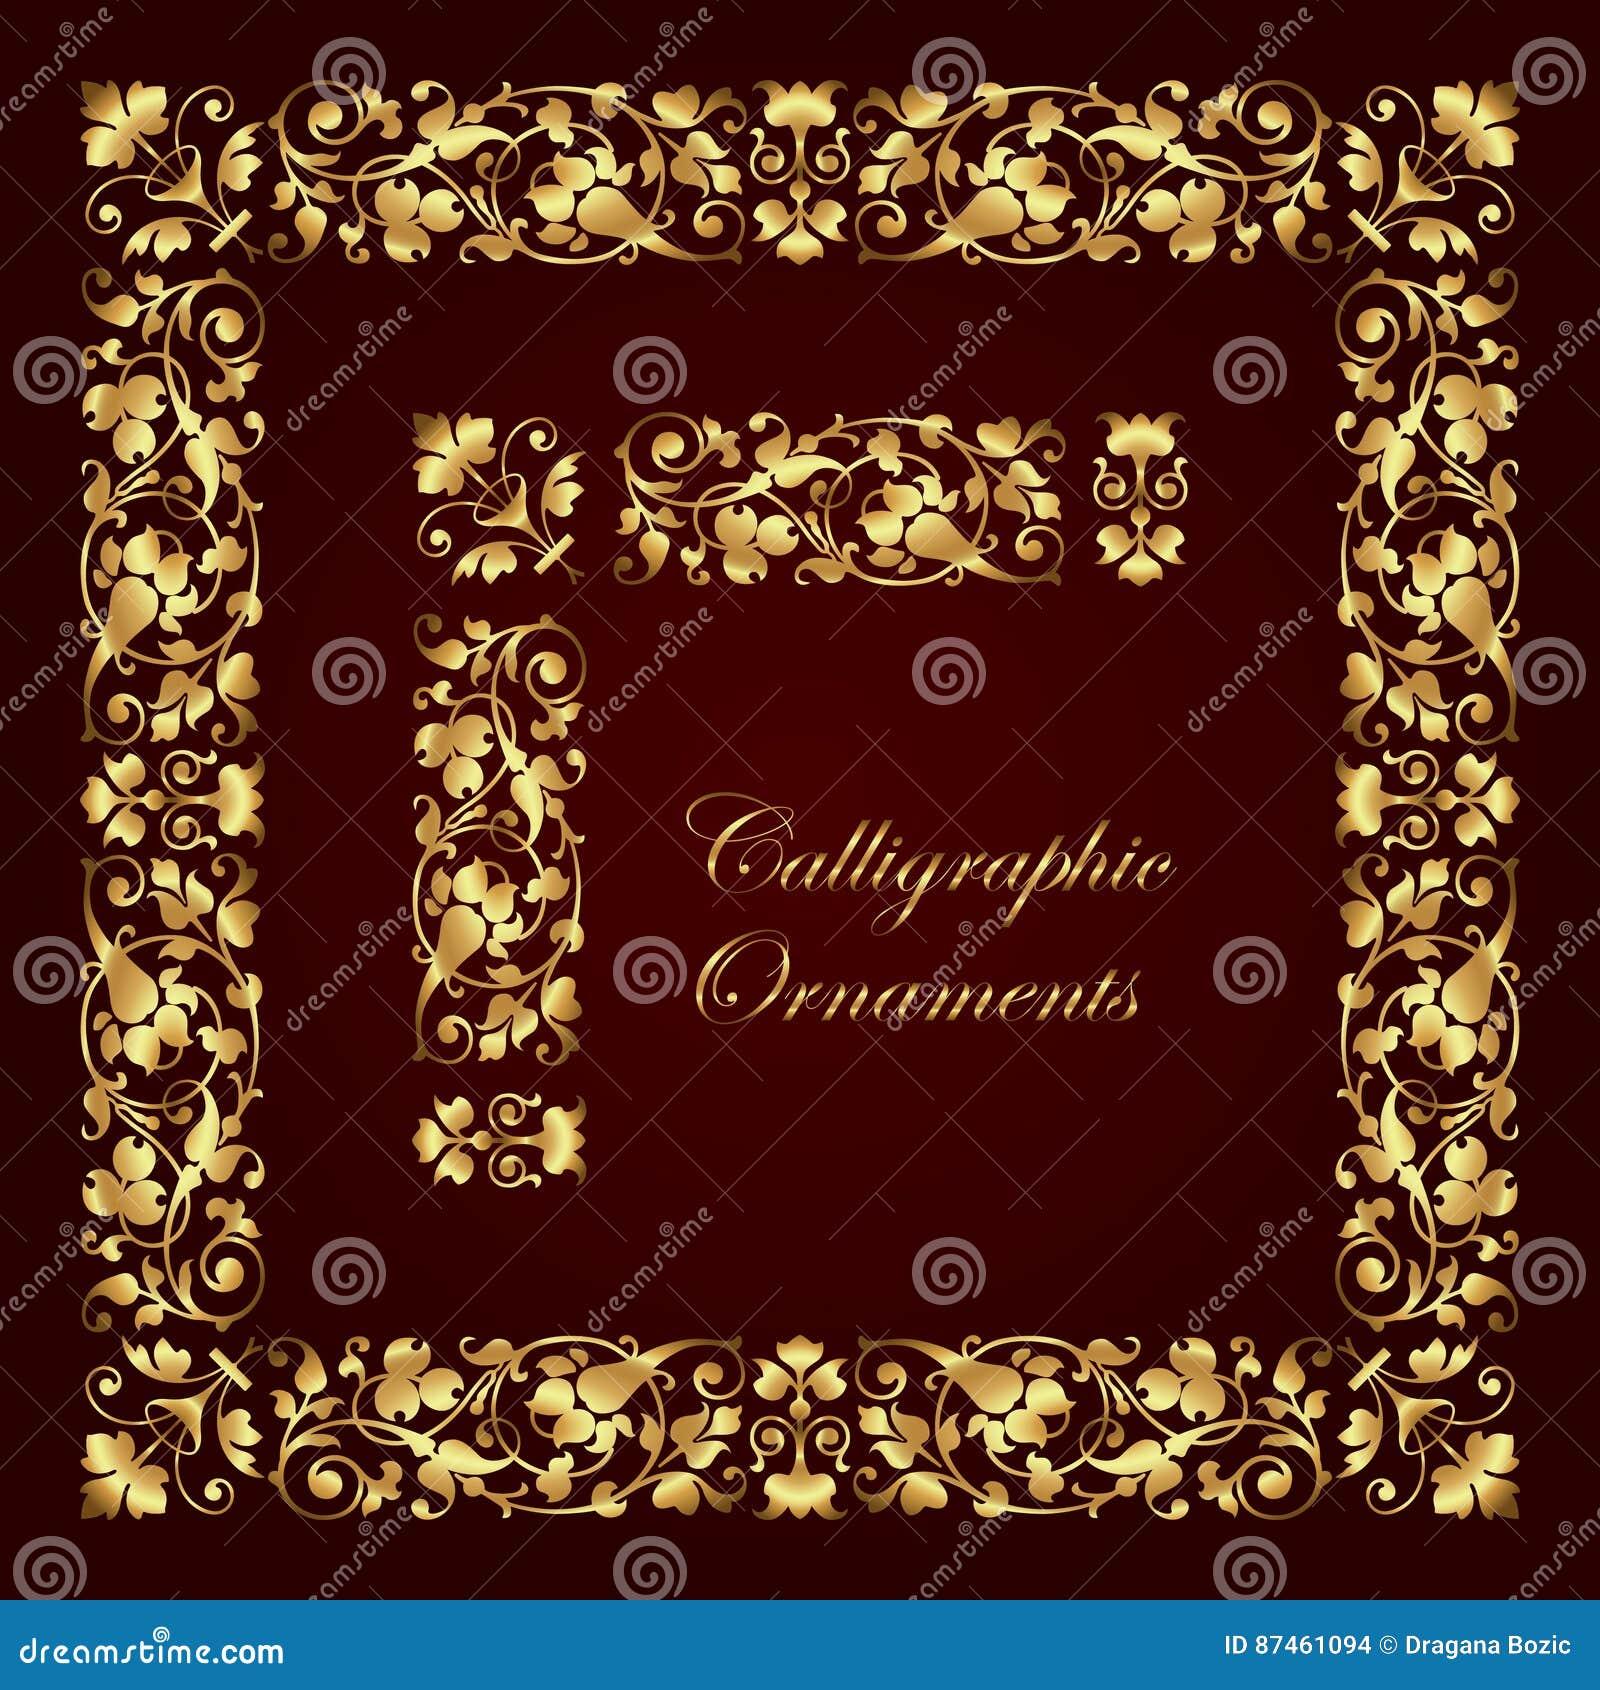 Golden Decorative Calligraphic Ornaments Corners Borders And